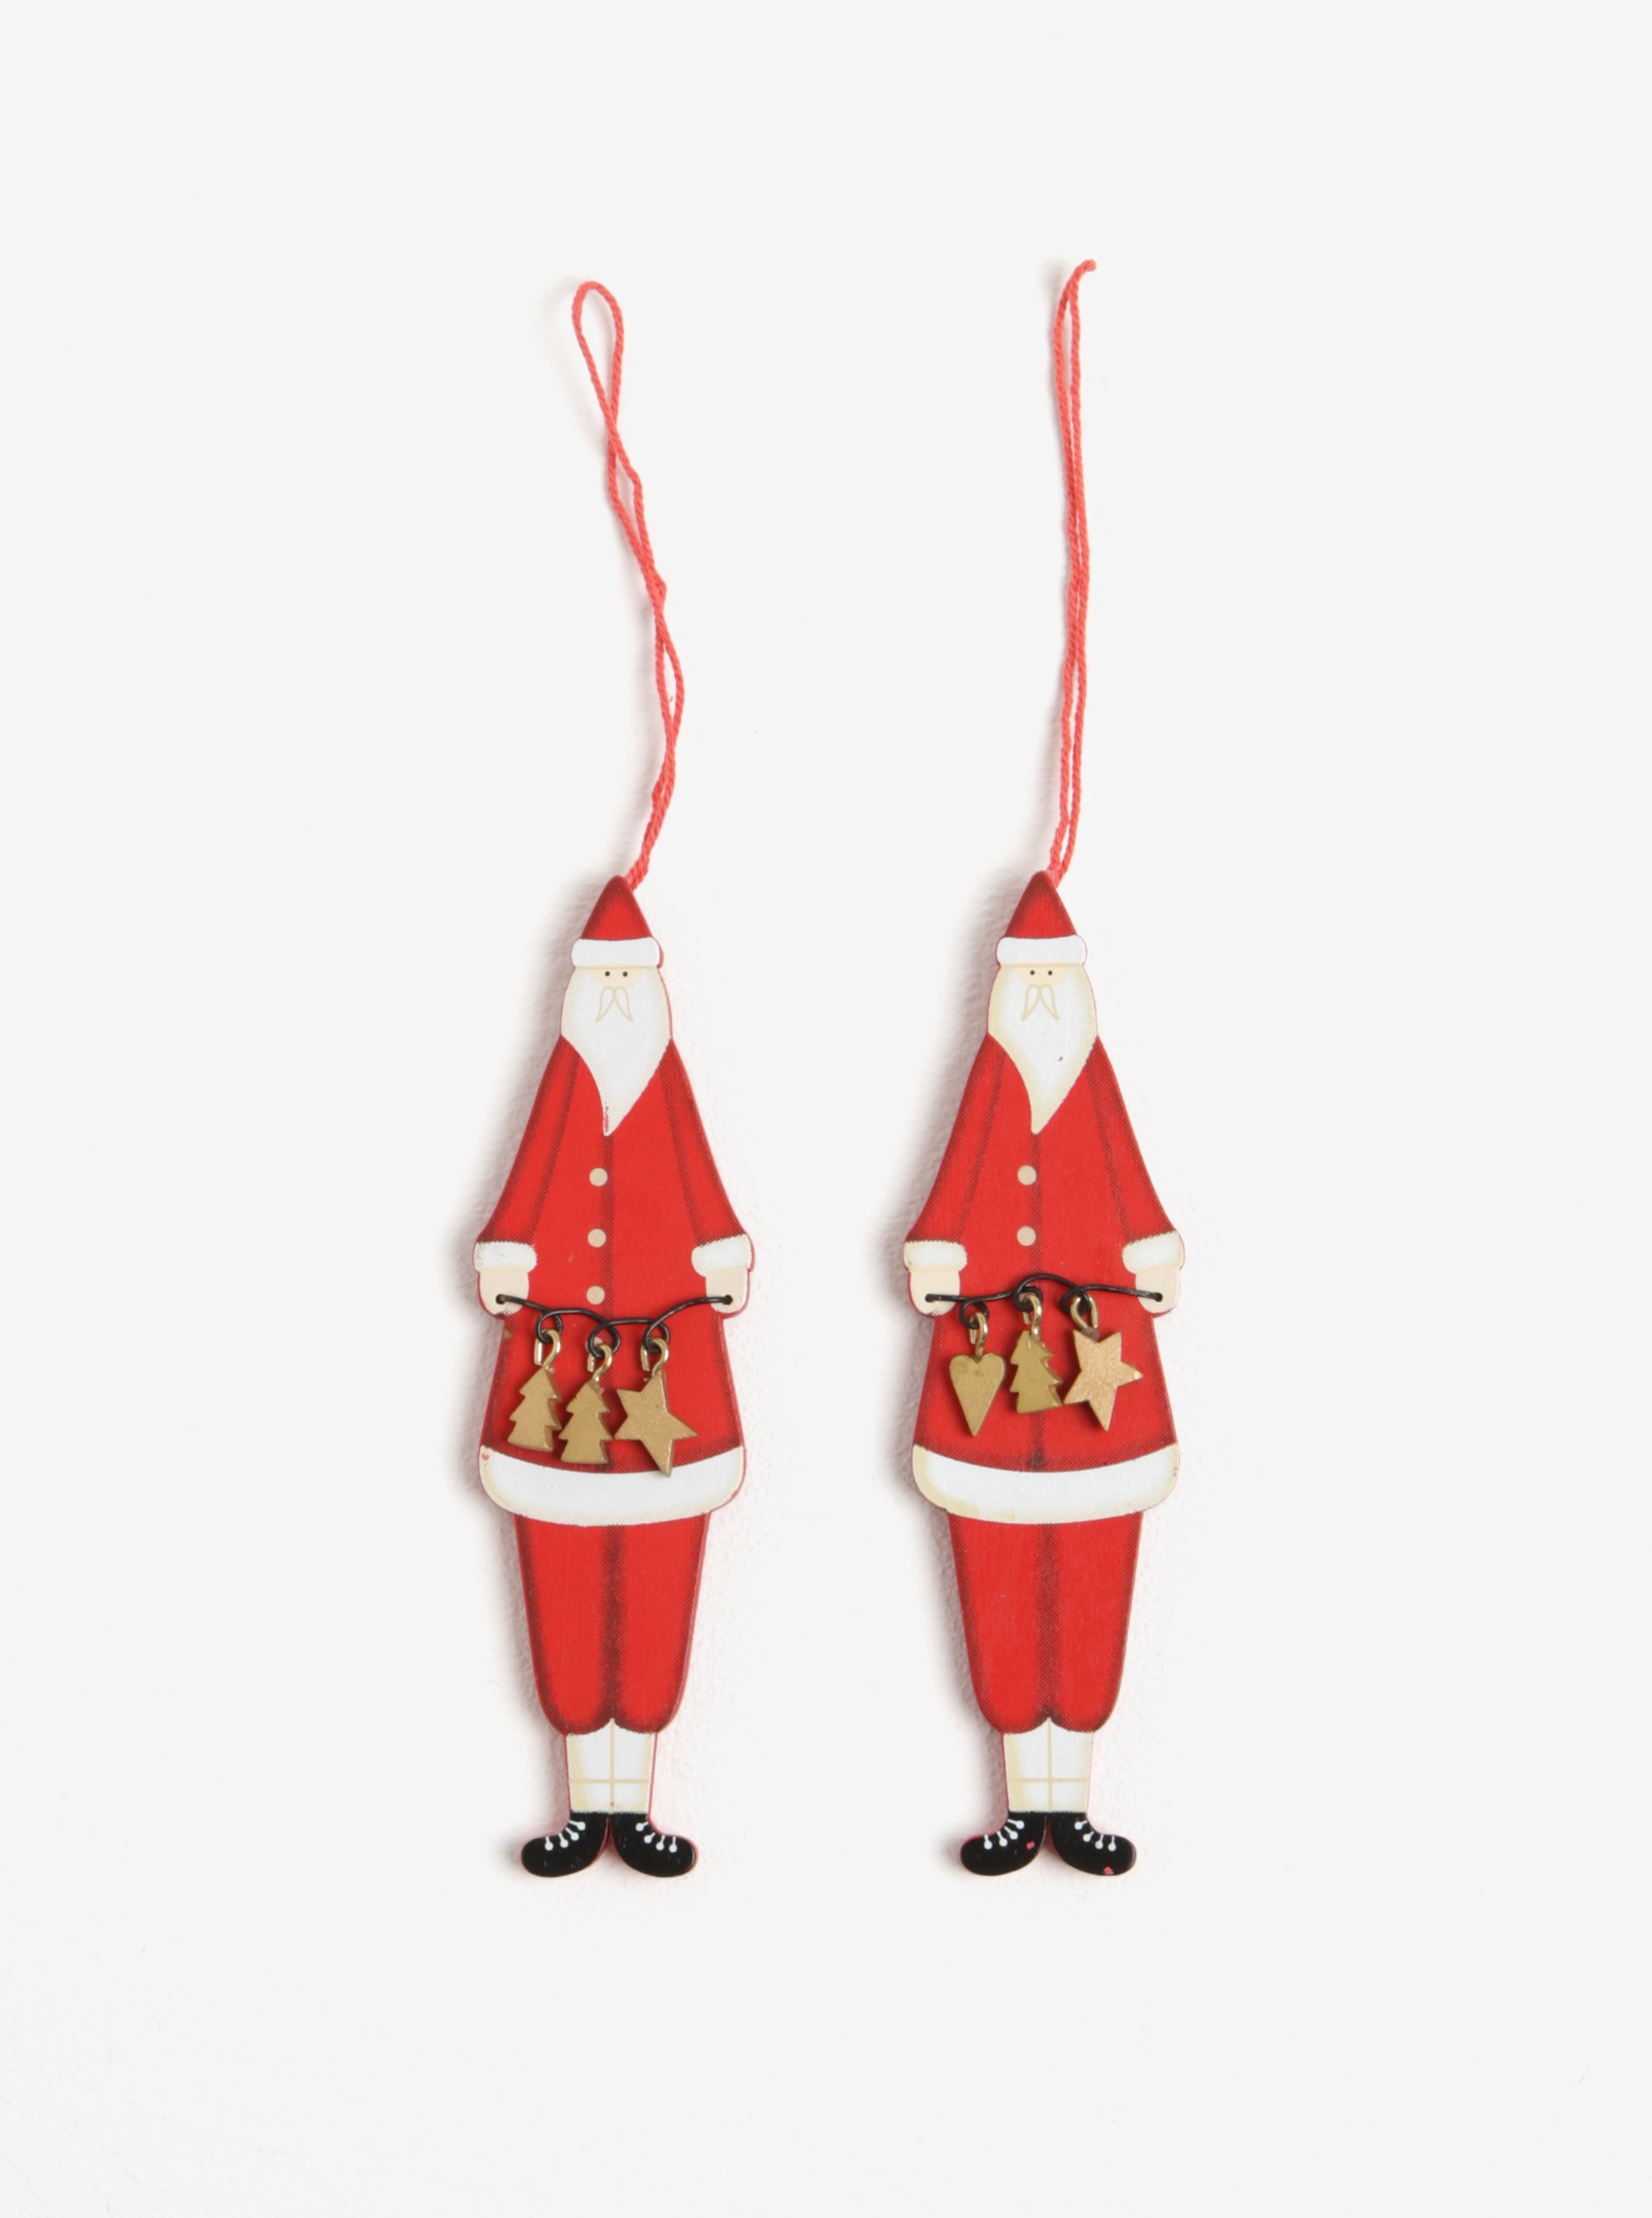 Sada dvou červených dřevěných ozdob ve tvaru Santa Clause Sass & Belle Nordic Santa